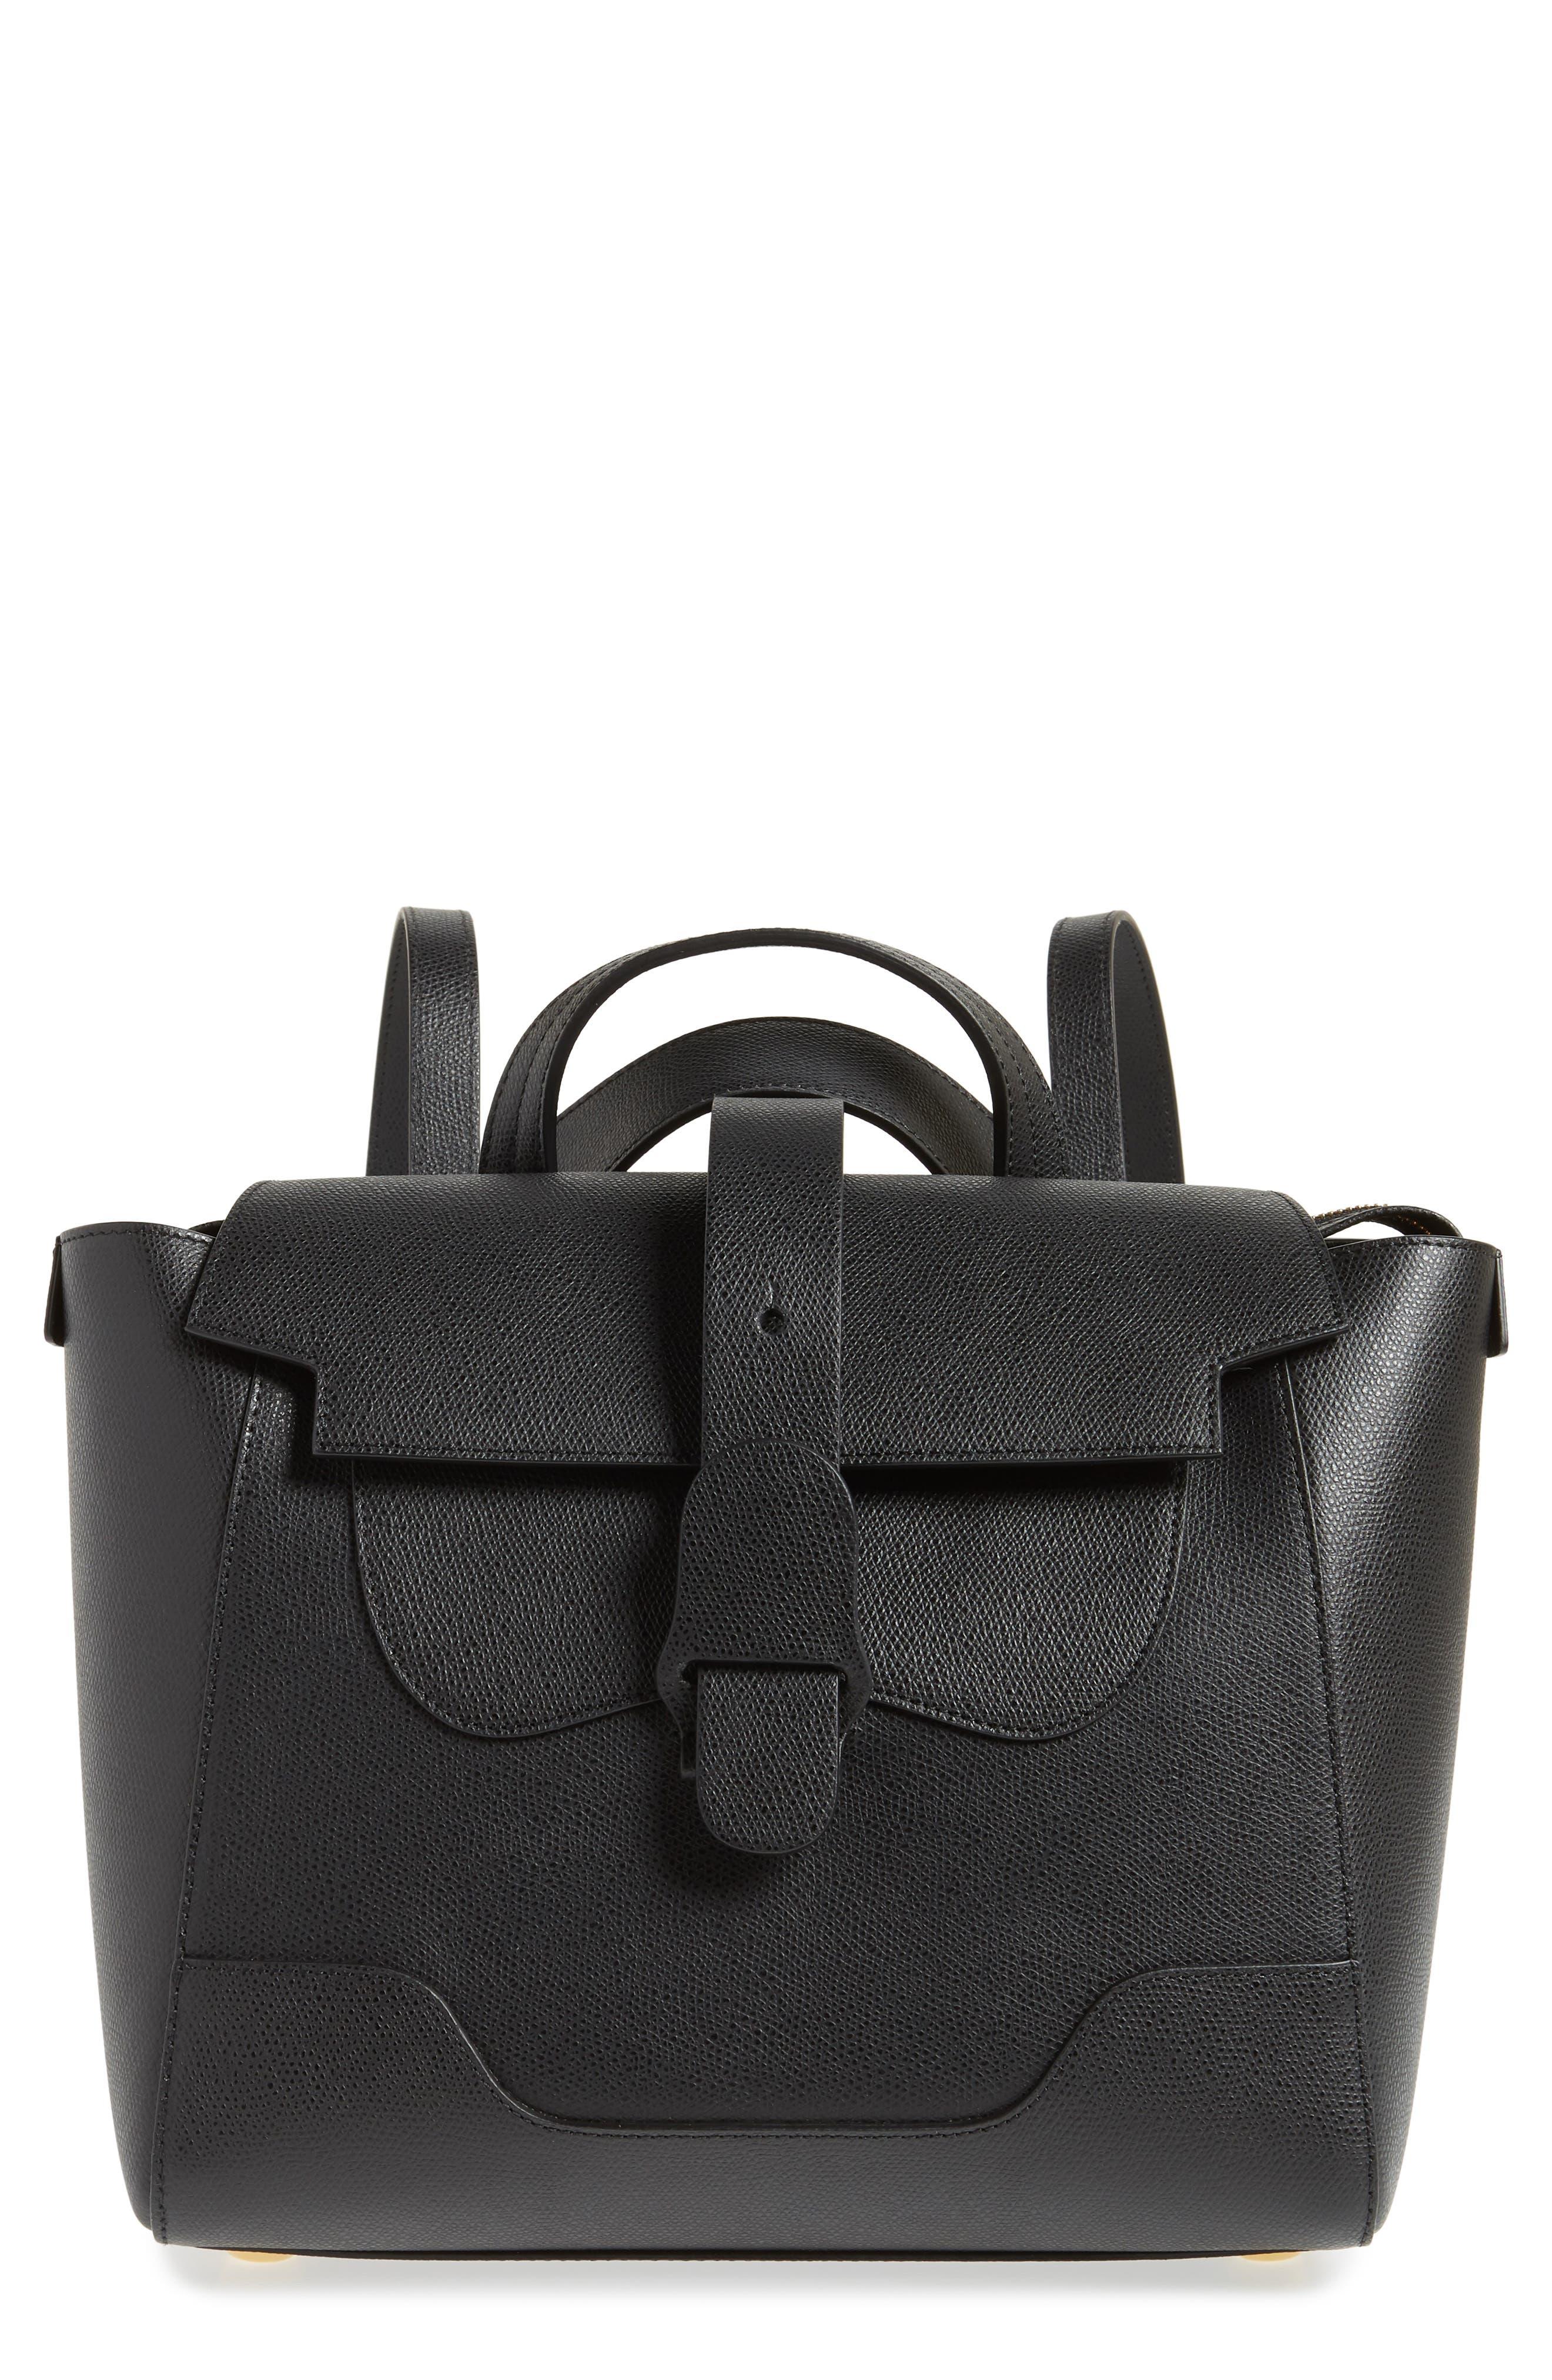 Medium Maestra Pebbled Leather Convertible Satchel, Main, color, NOIR